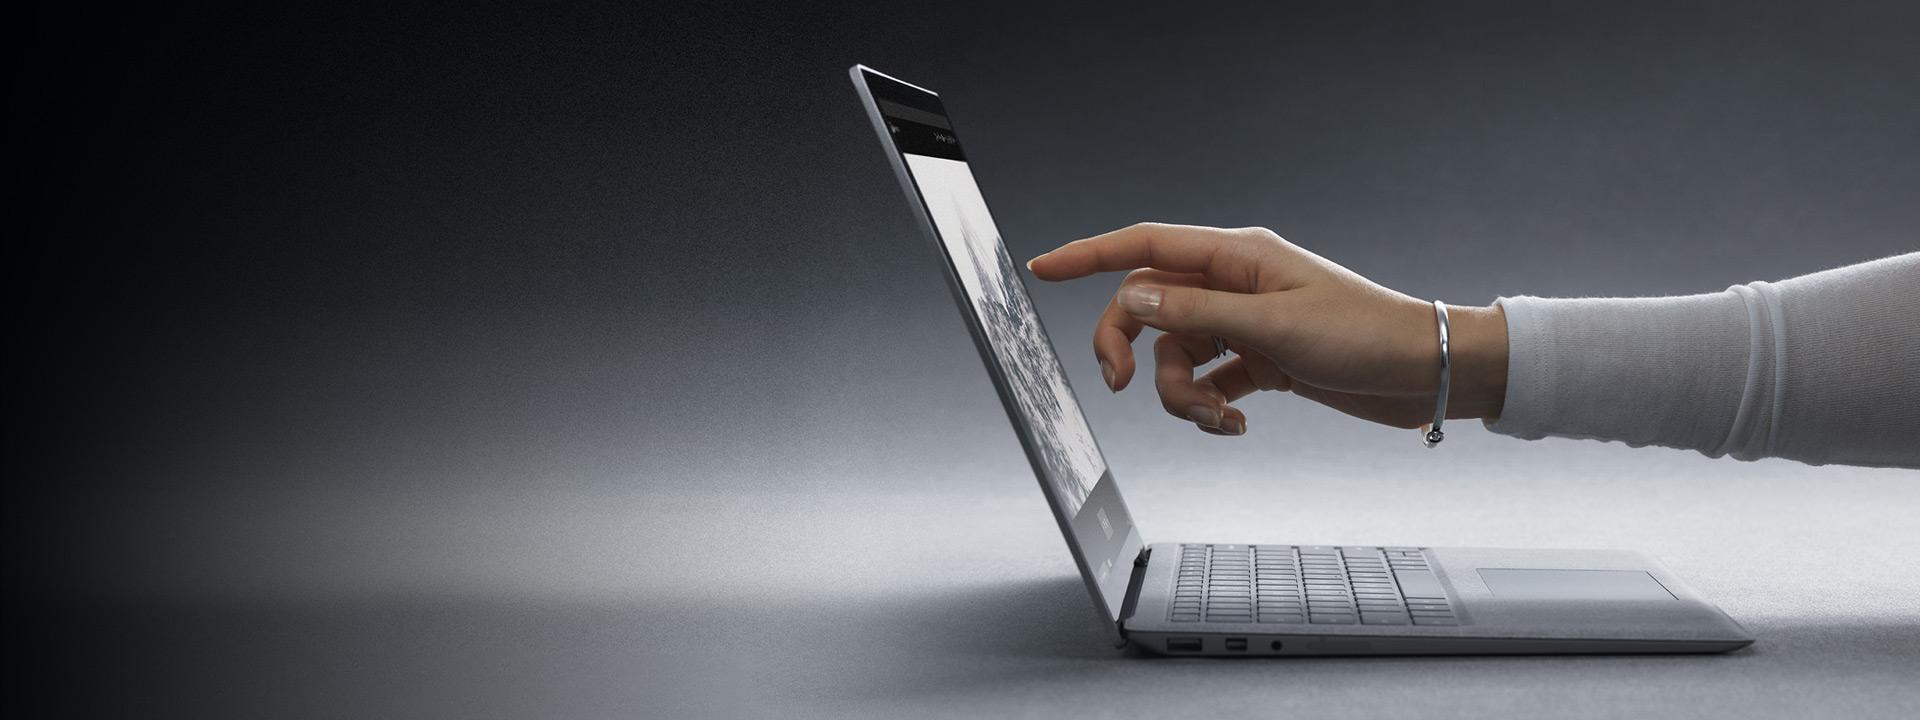 Seorang gadis menyentuh skrin pada Surface Laptop 2